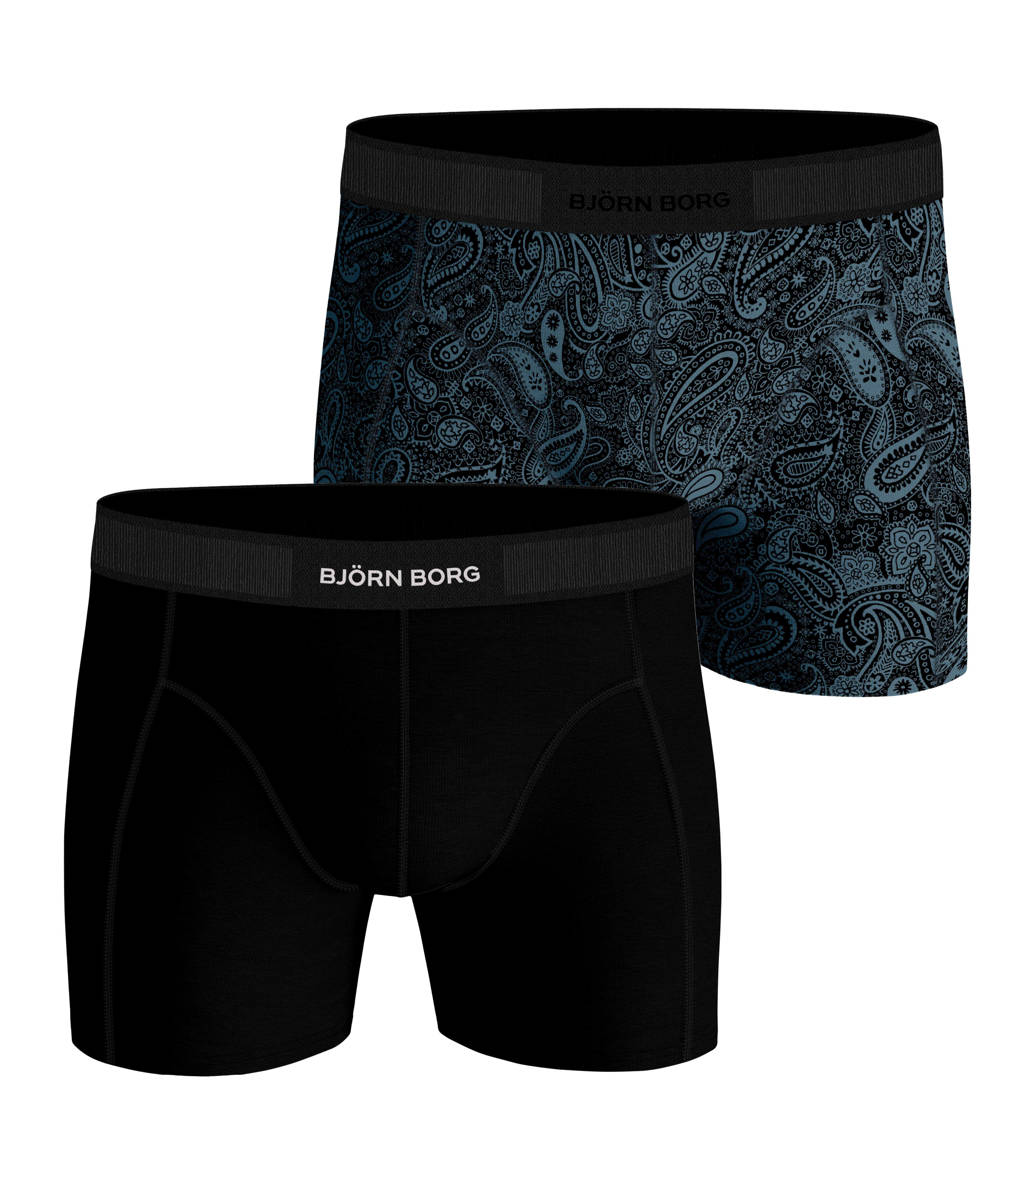 Björn Borg boxershort (set van 2), Zwart/navy/blauw/marine